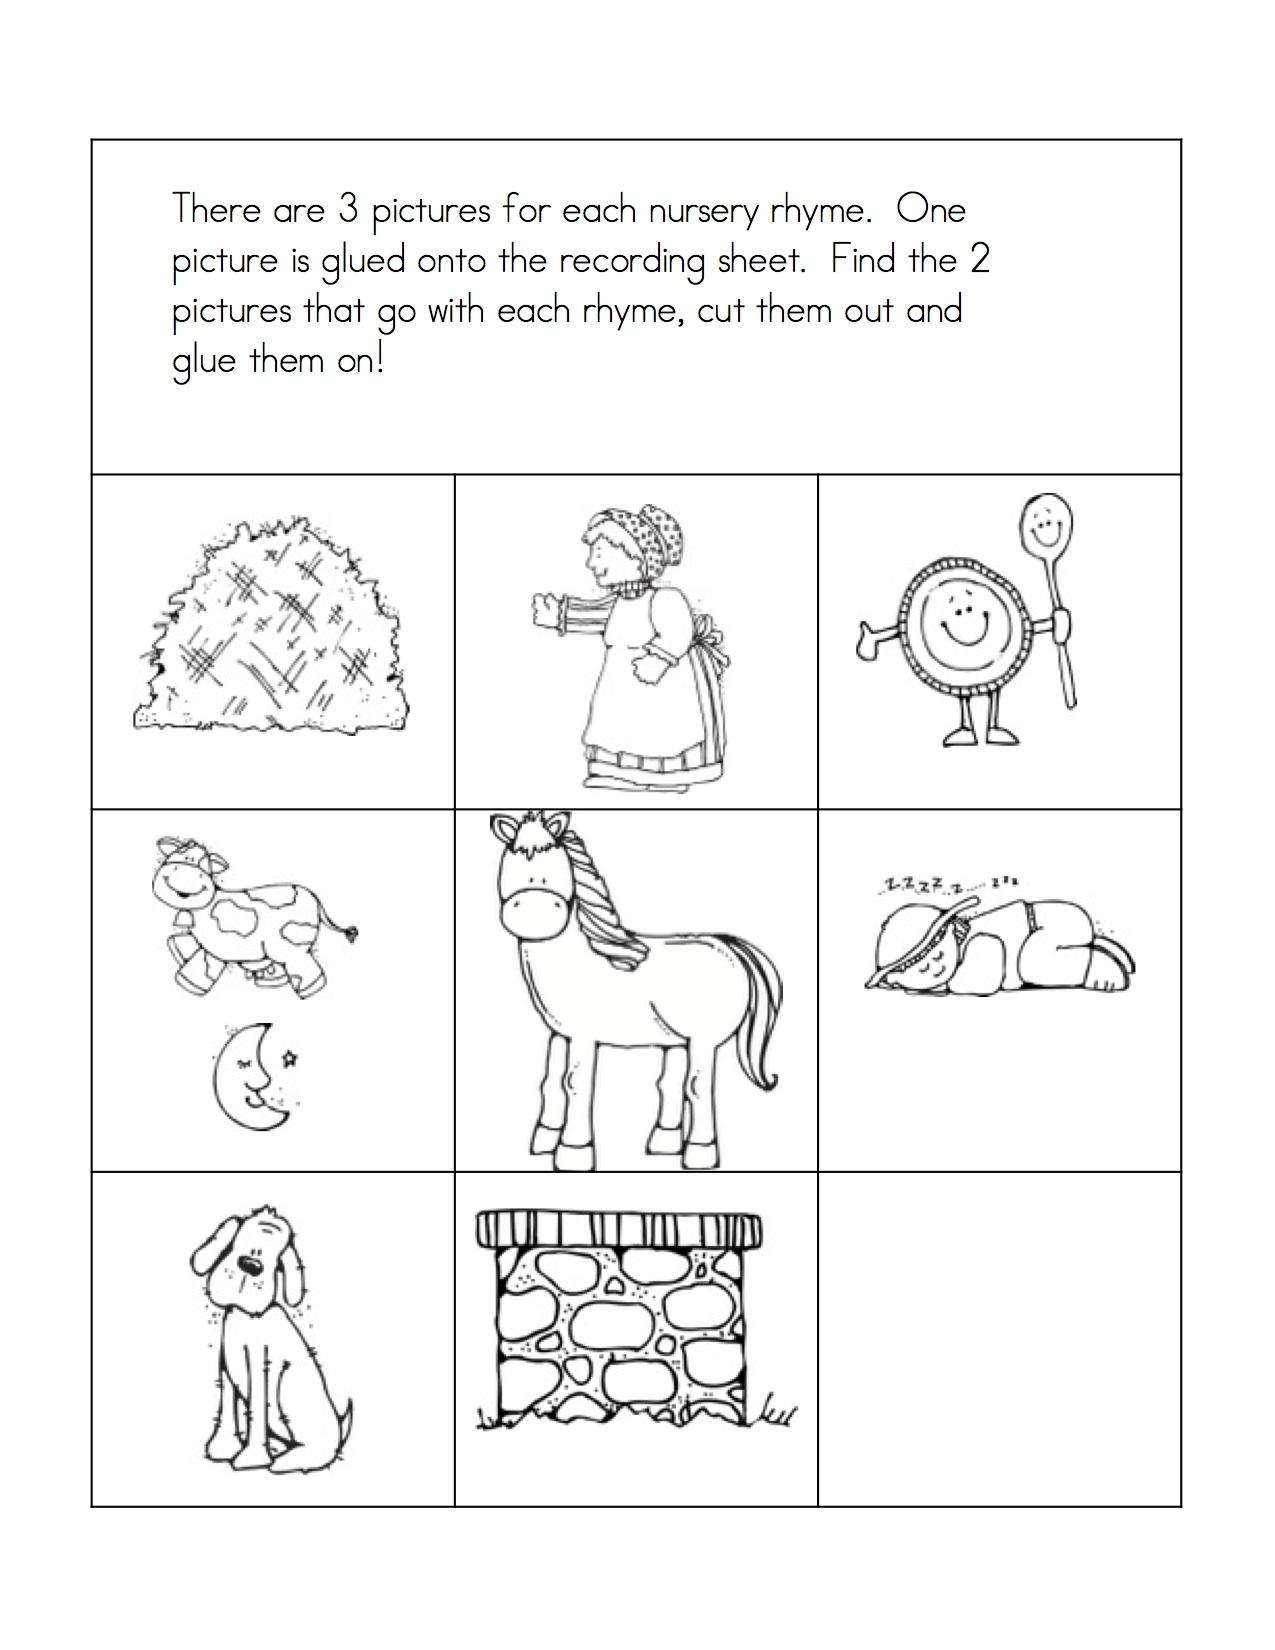 worksheet Words That Rhyme With Work more fun with nursery rhymes kindergarten nana matching game 2